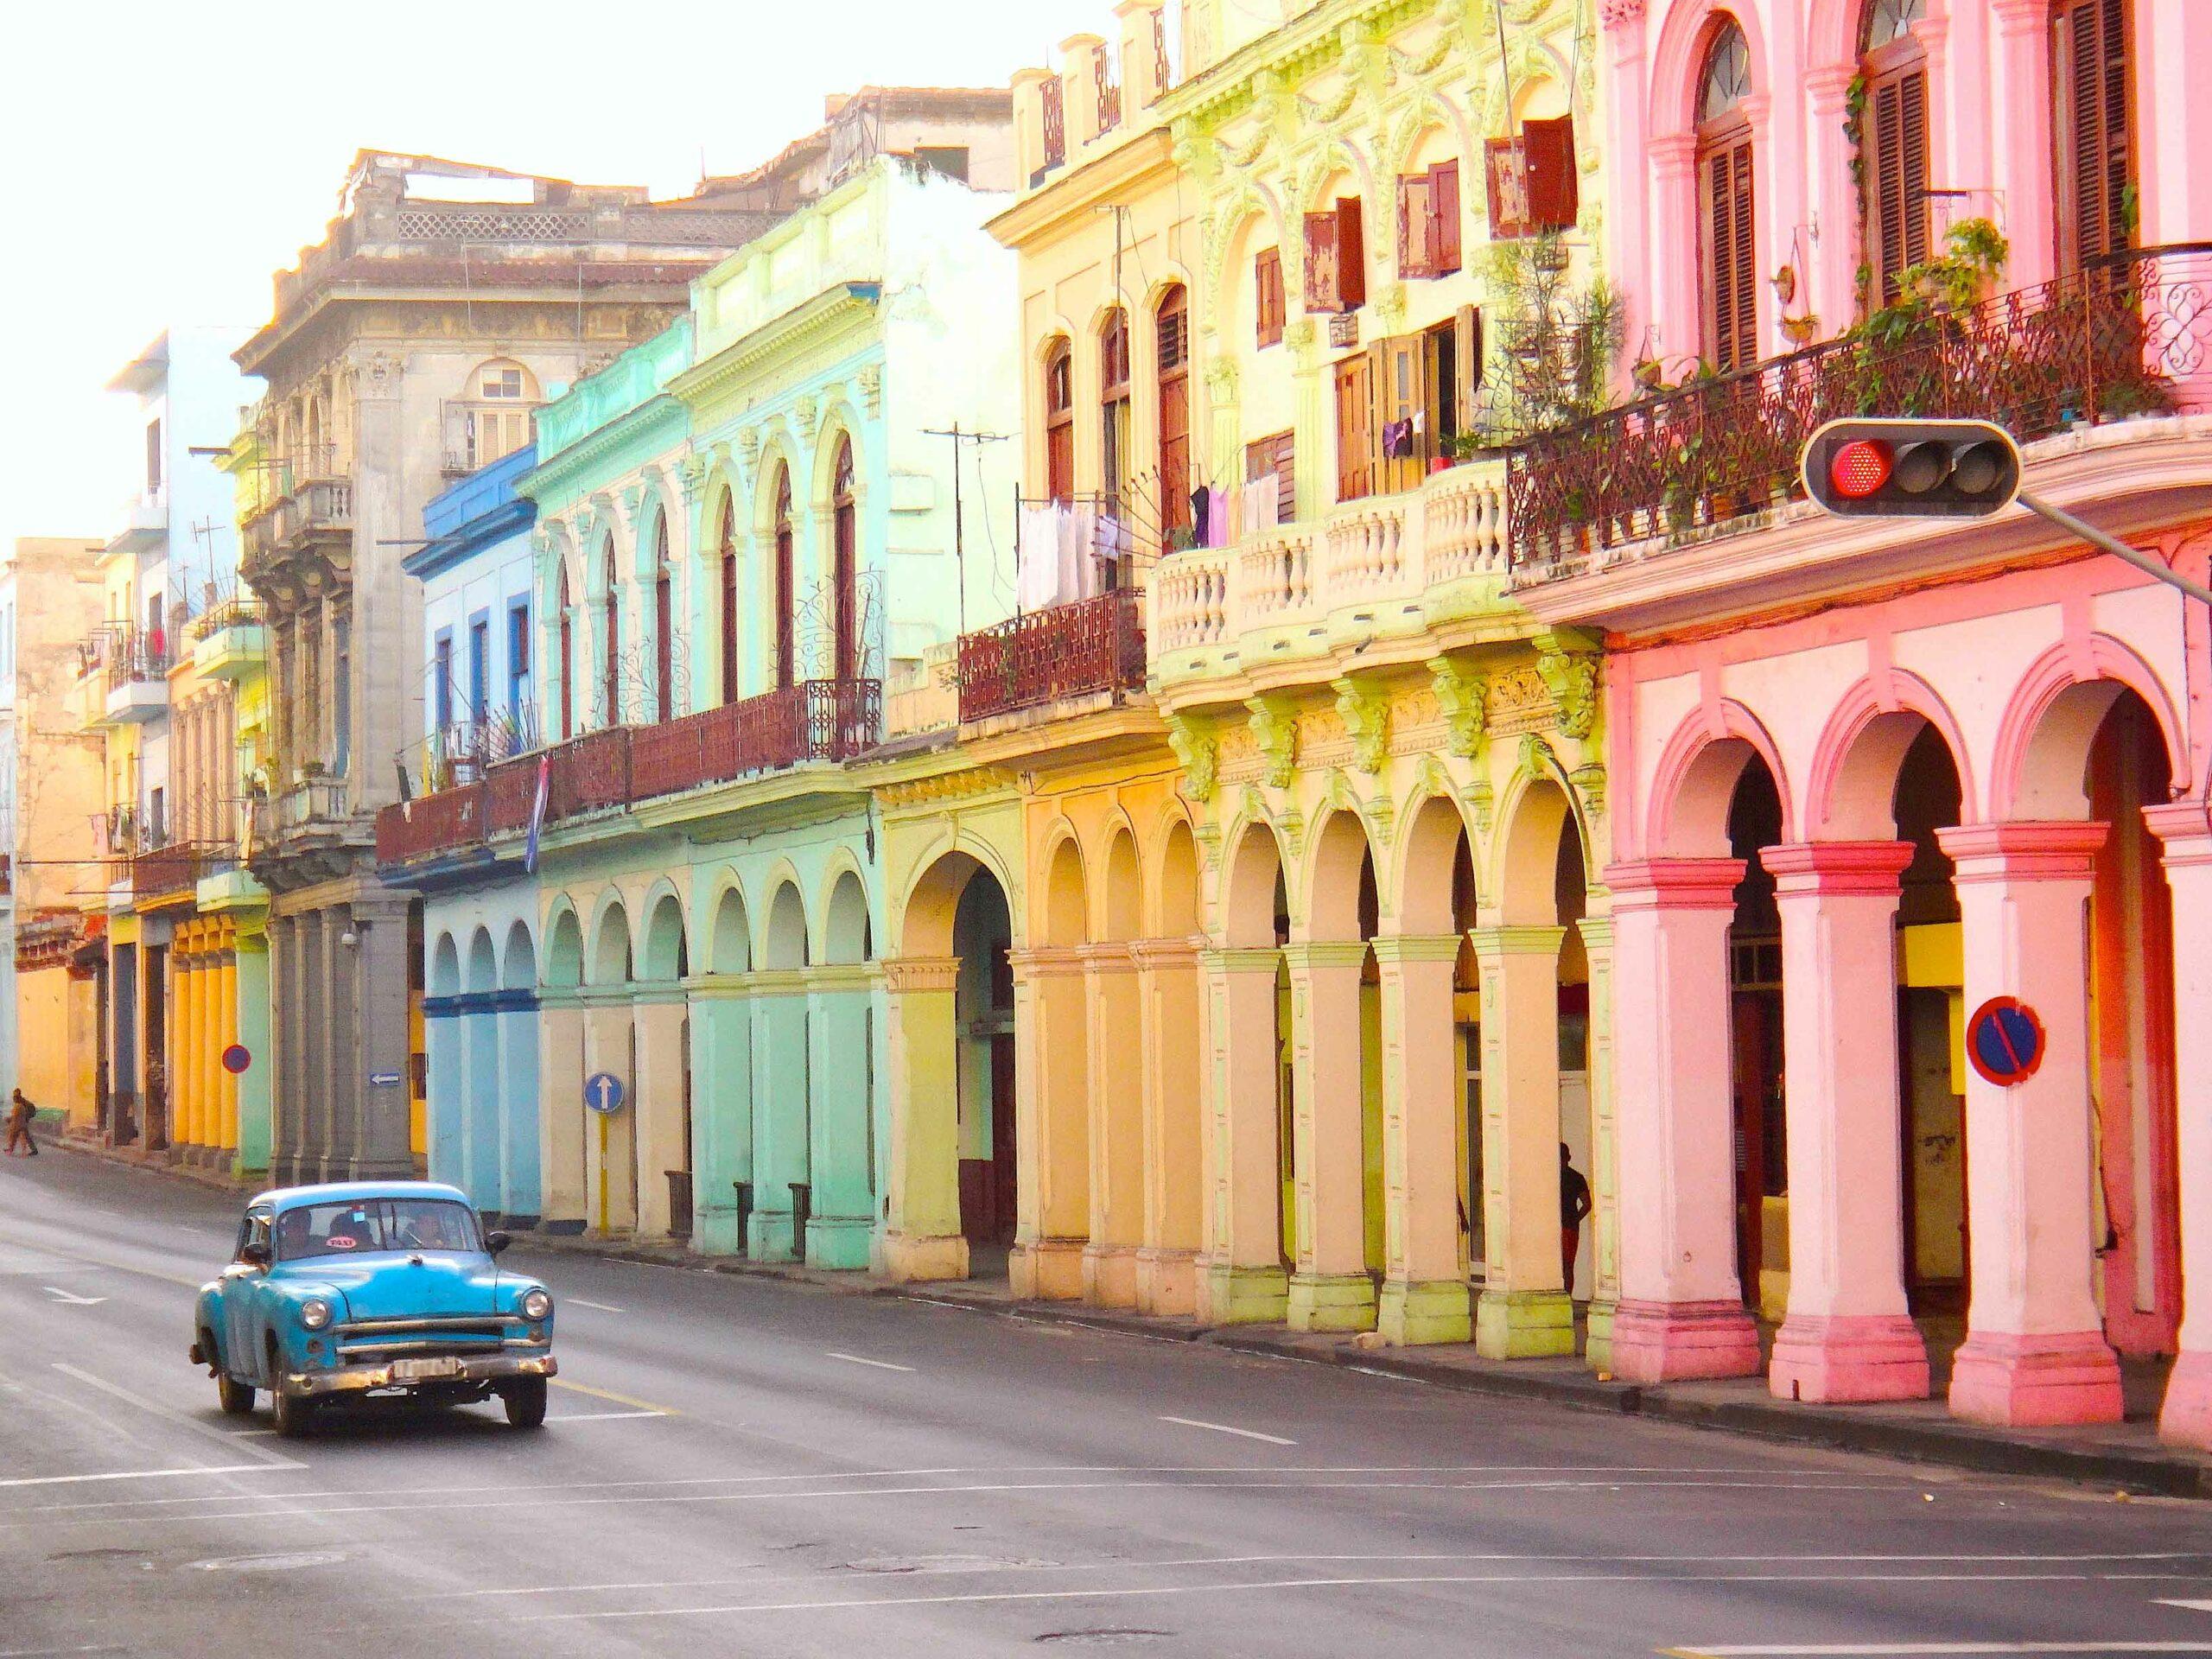 Rebuilding The Fifties: How Havana's Classic Cars Became Uniquely Cuban